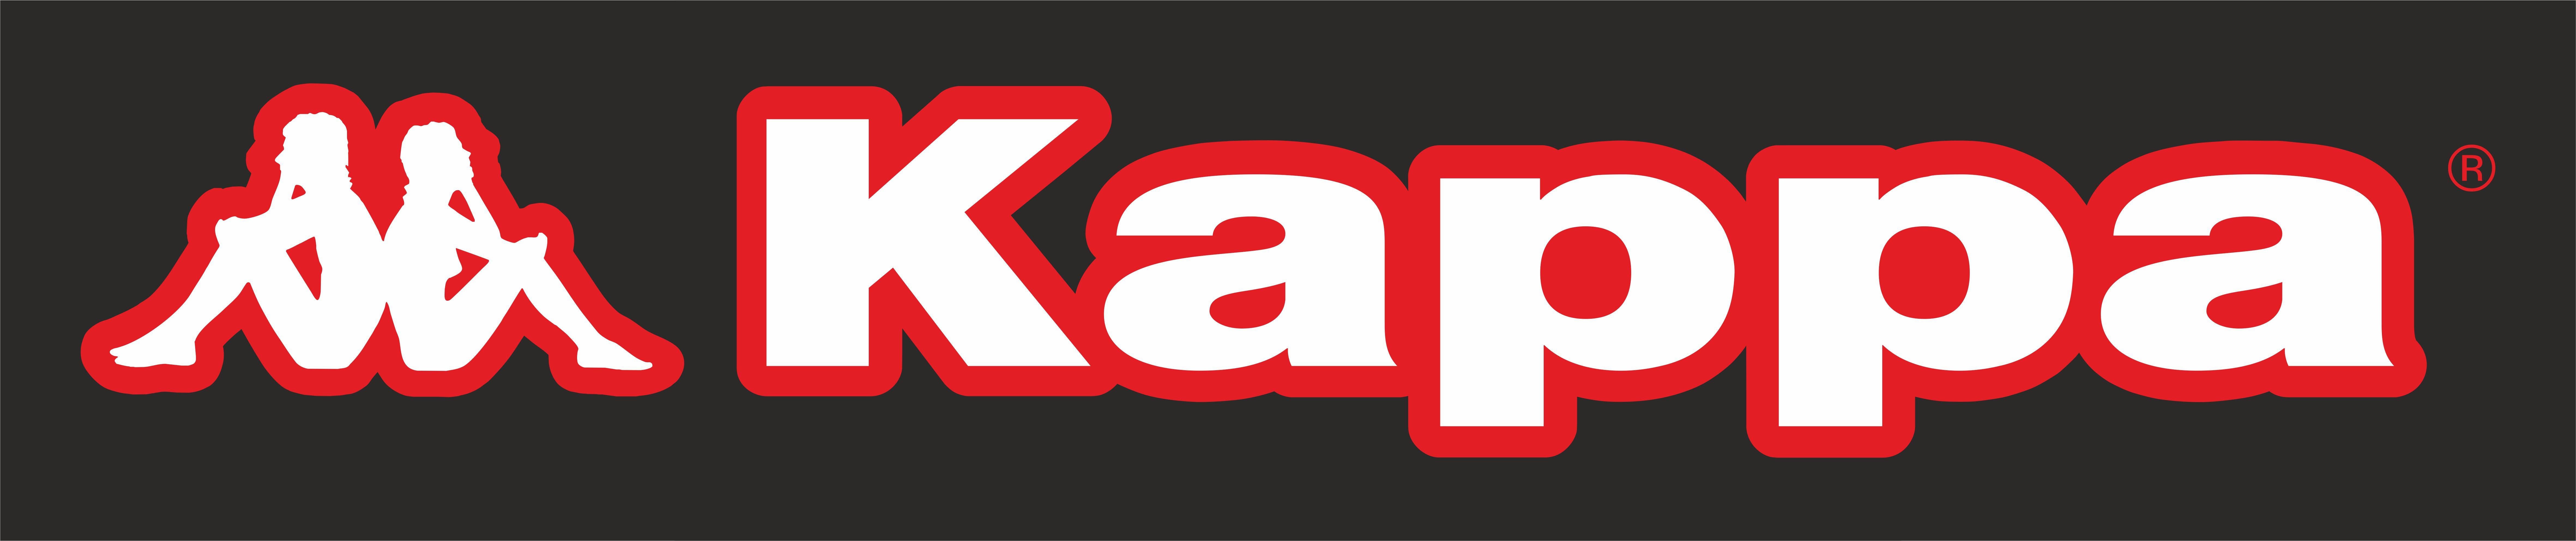 kappa-2020-club-banner.jpg